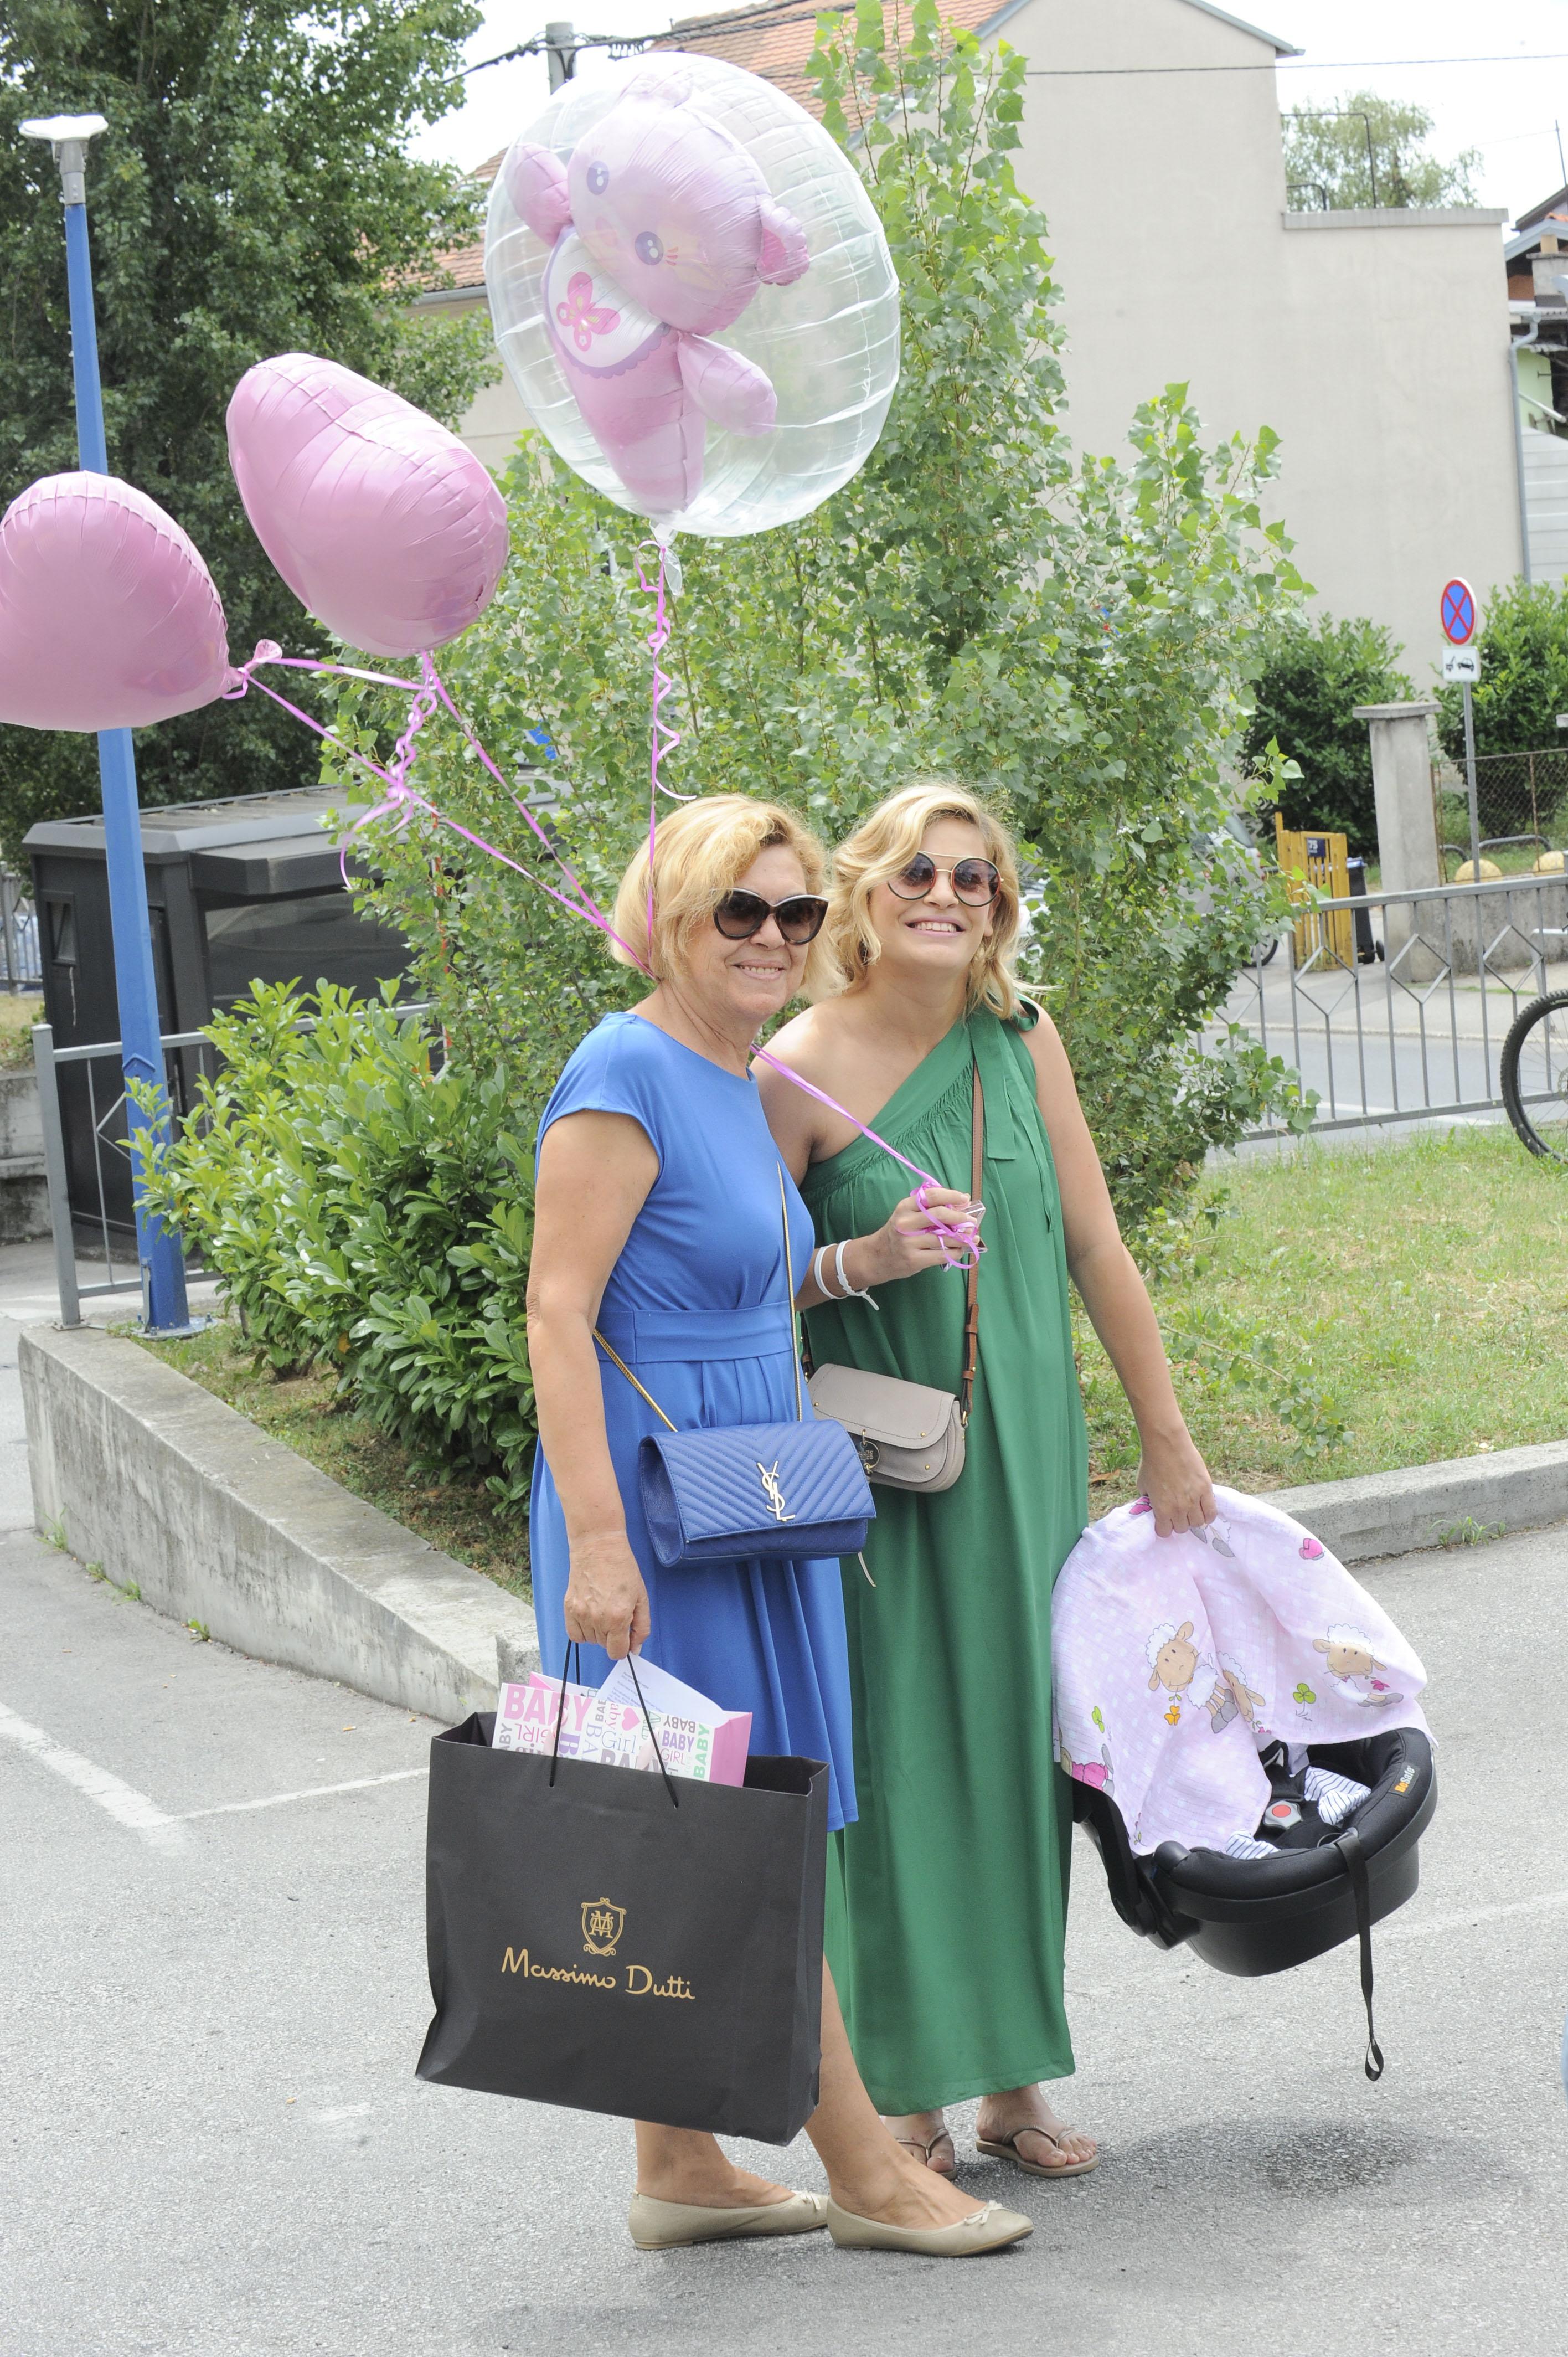 Nevena Rendeli izlazak iz rodilista / bolnica Sveti Duh / Zagreb 13.07.2017. / foto: Davor Matota / Mak Vejzovic i Nevena Rendeli i kcerke Lea i Mare i majka Marija Rendeli